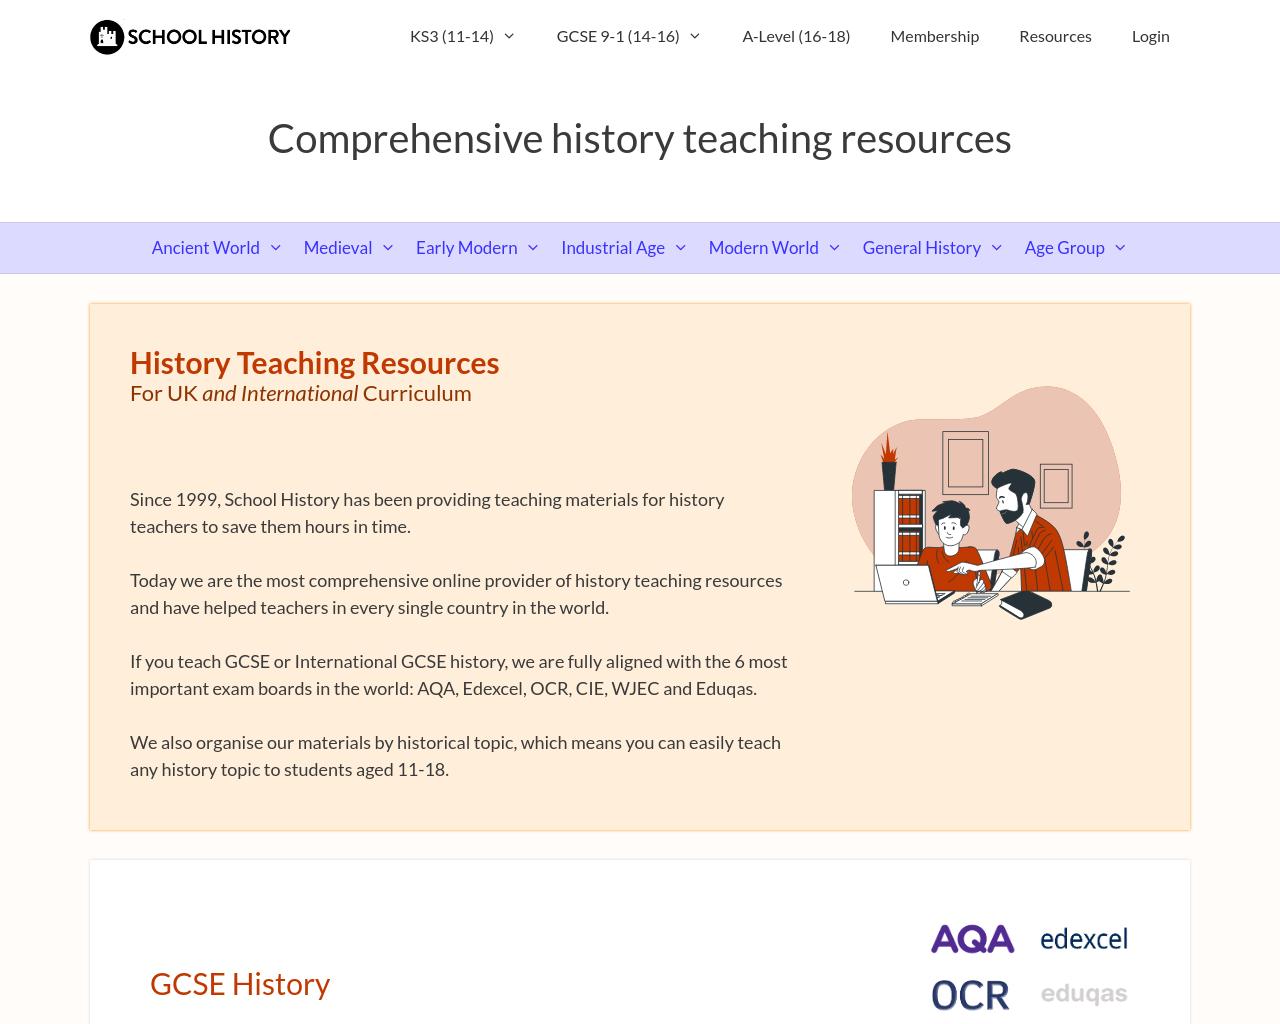 School History - Curricular activities